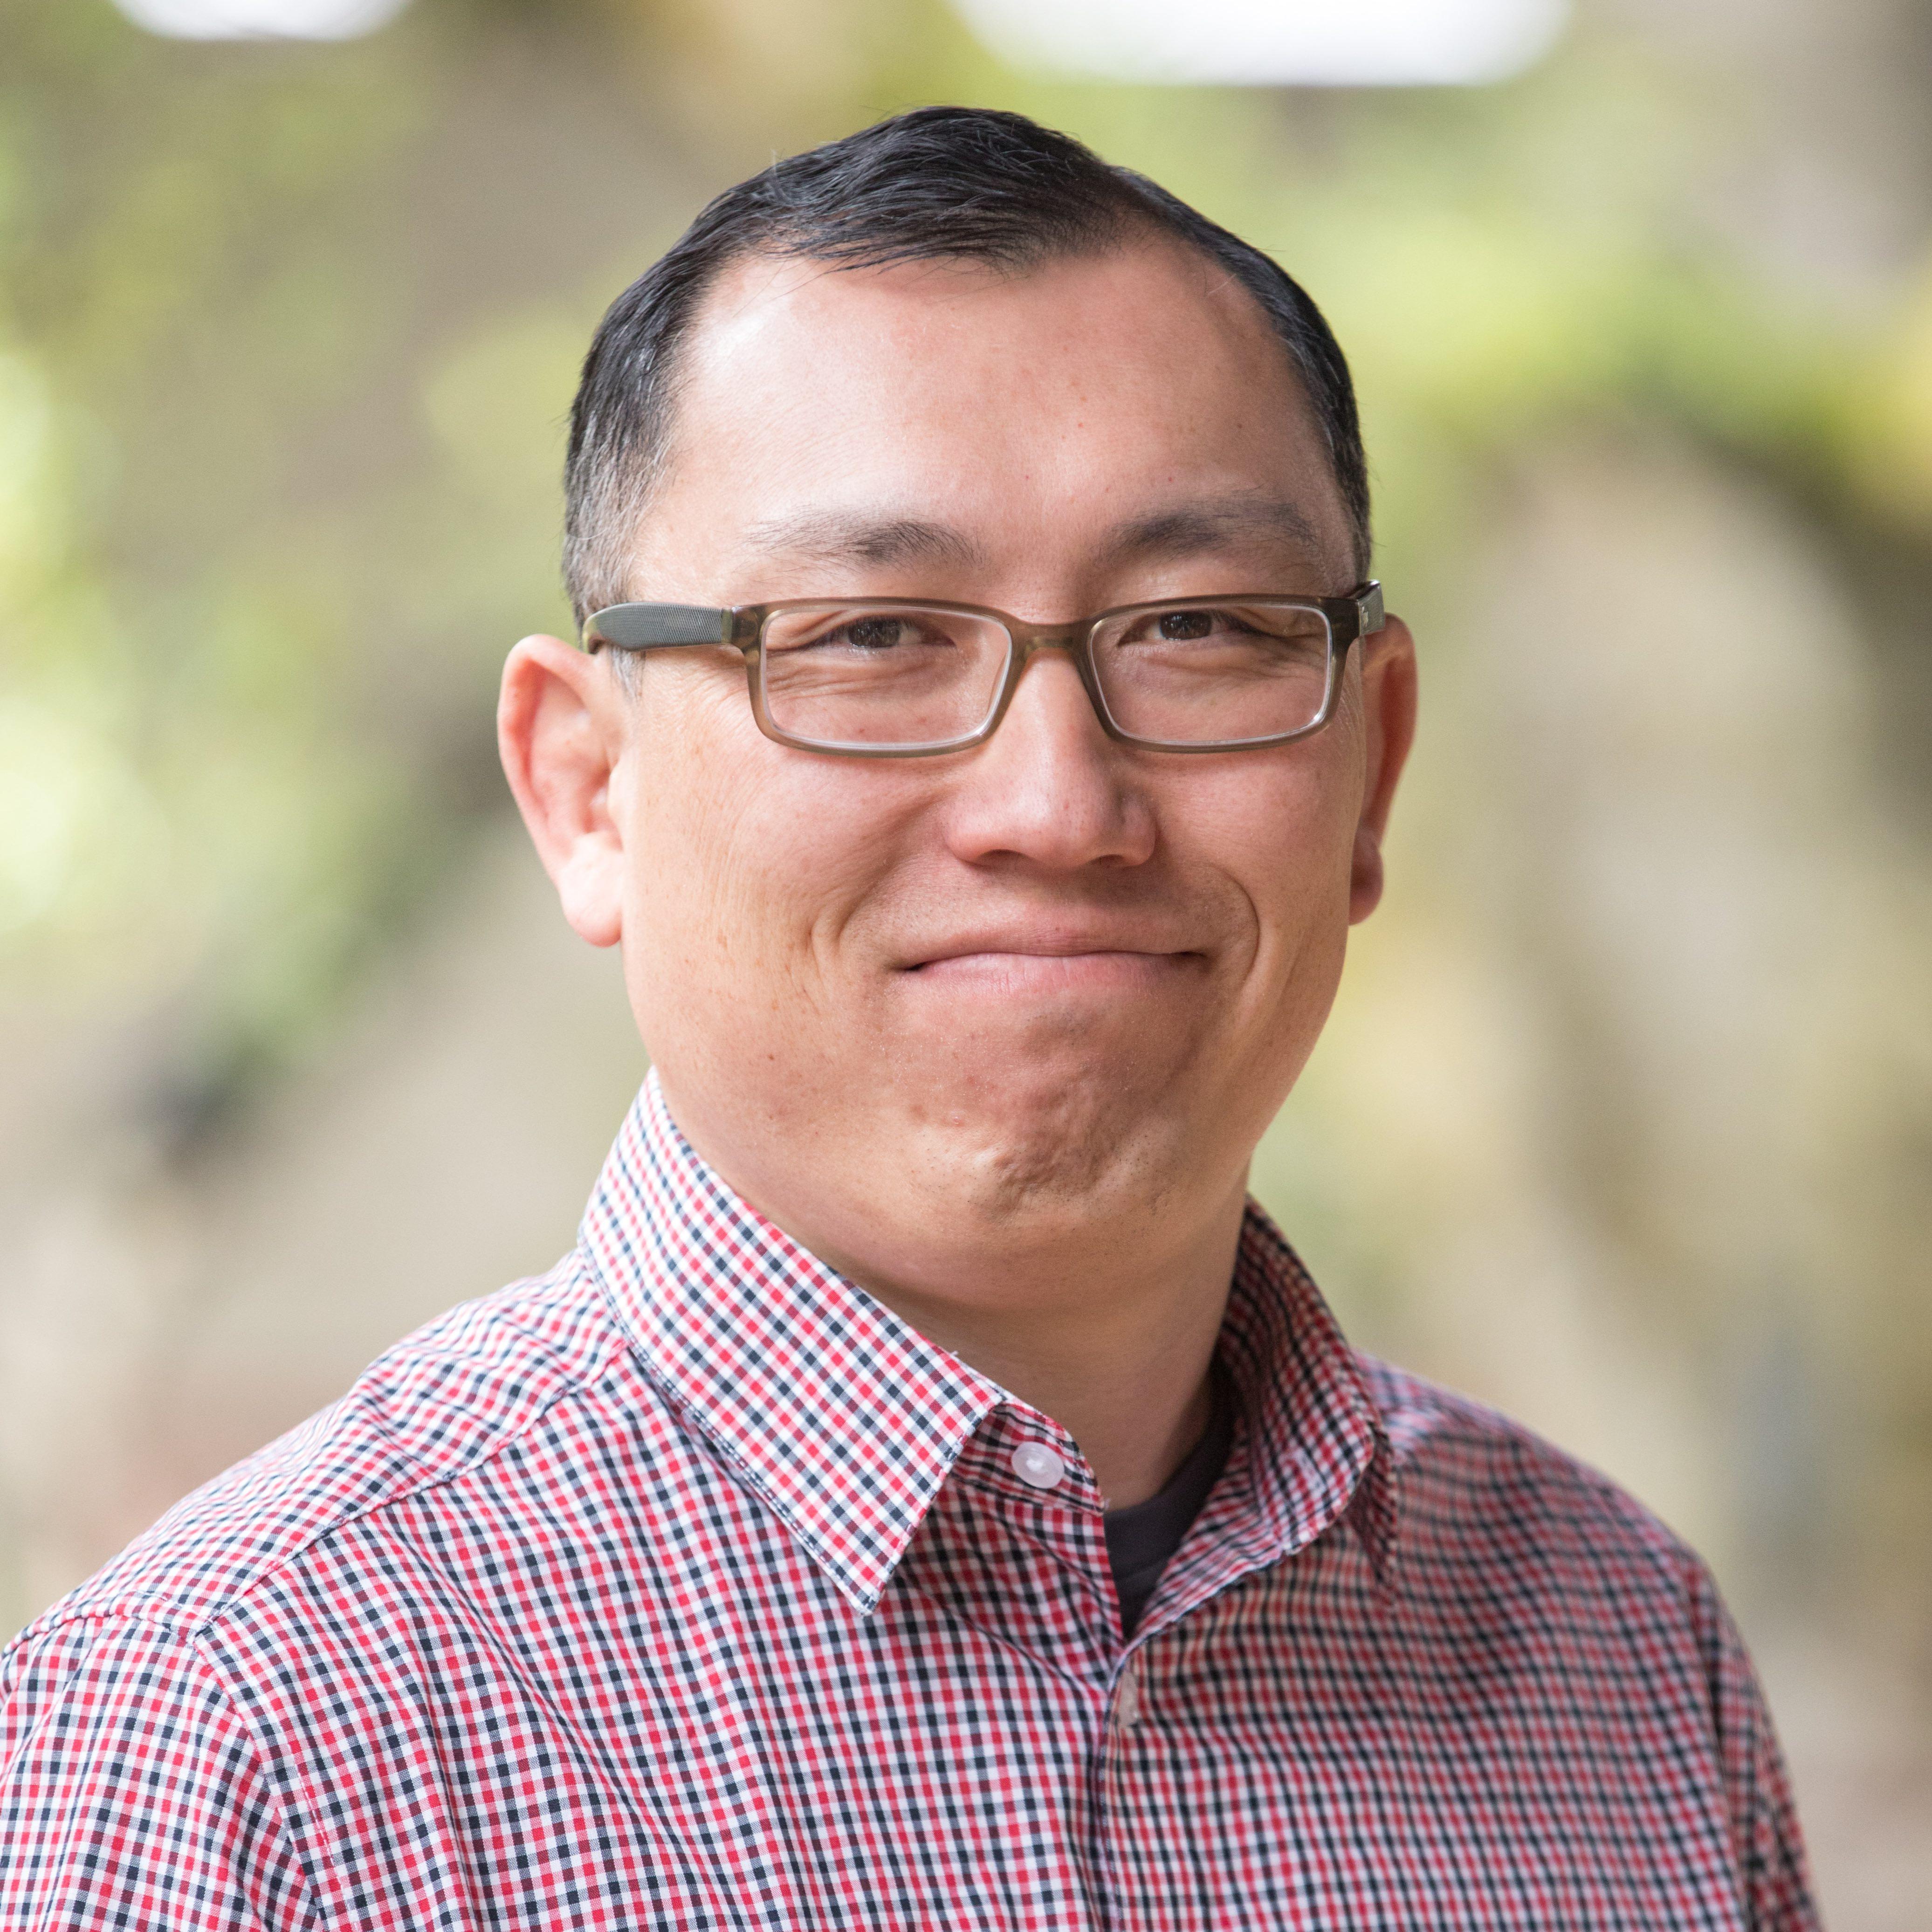 Glenn Saito, Assistant Director of Academic Technology